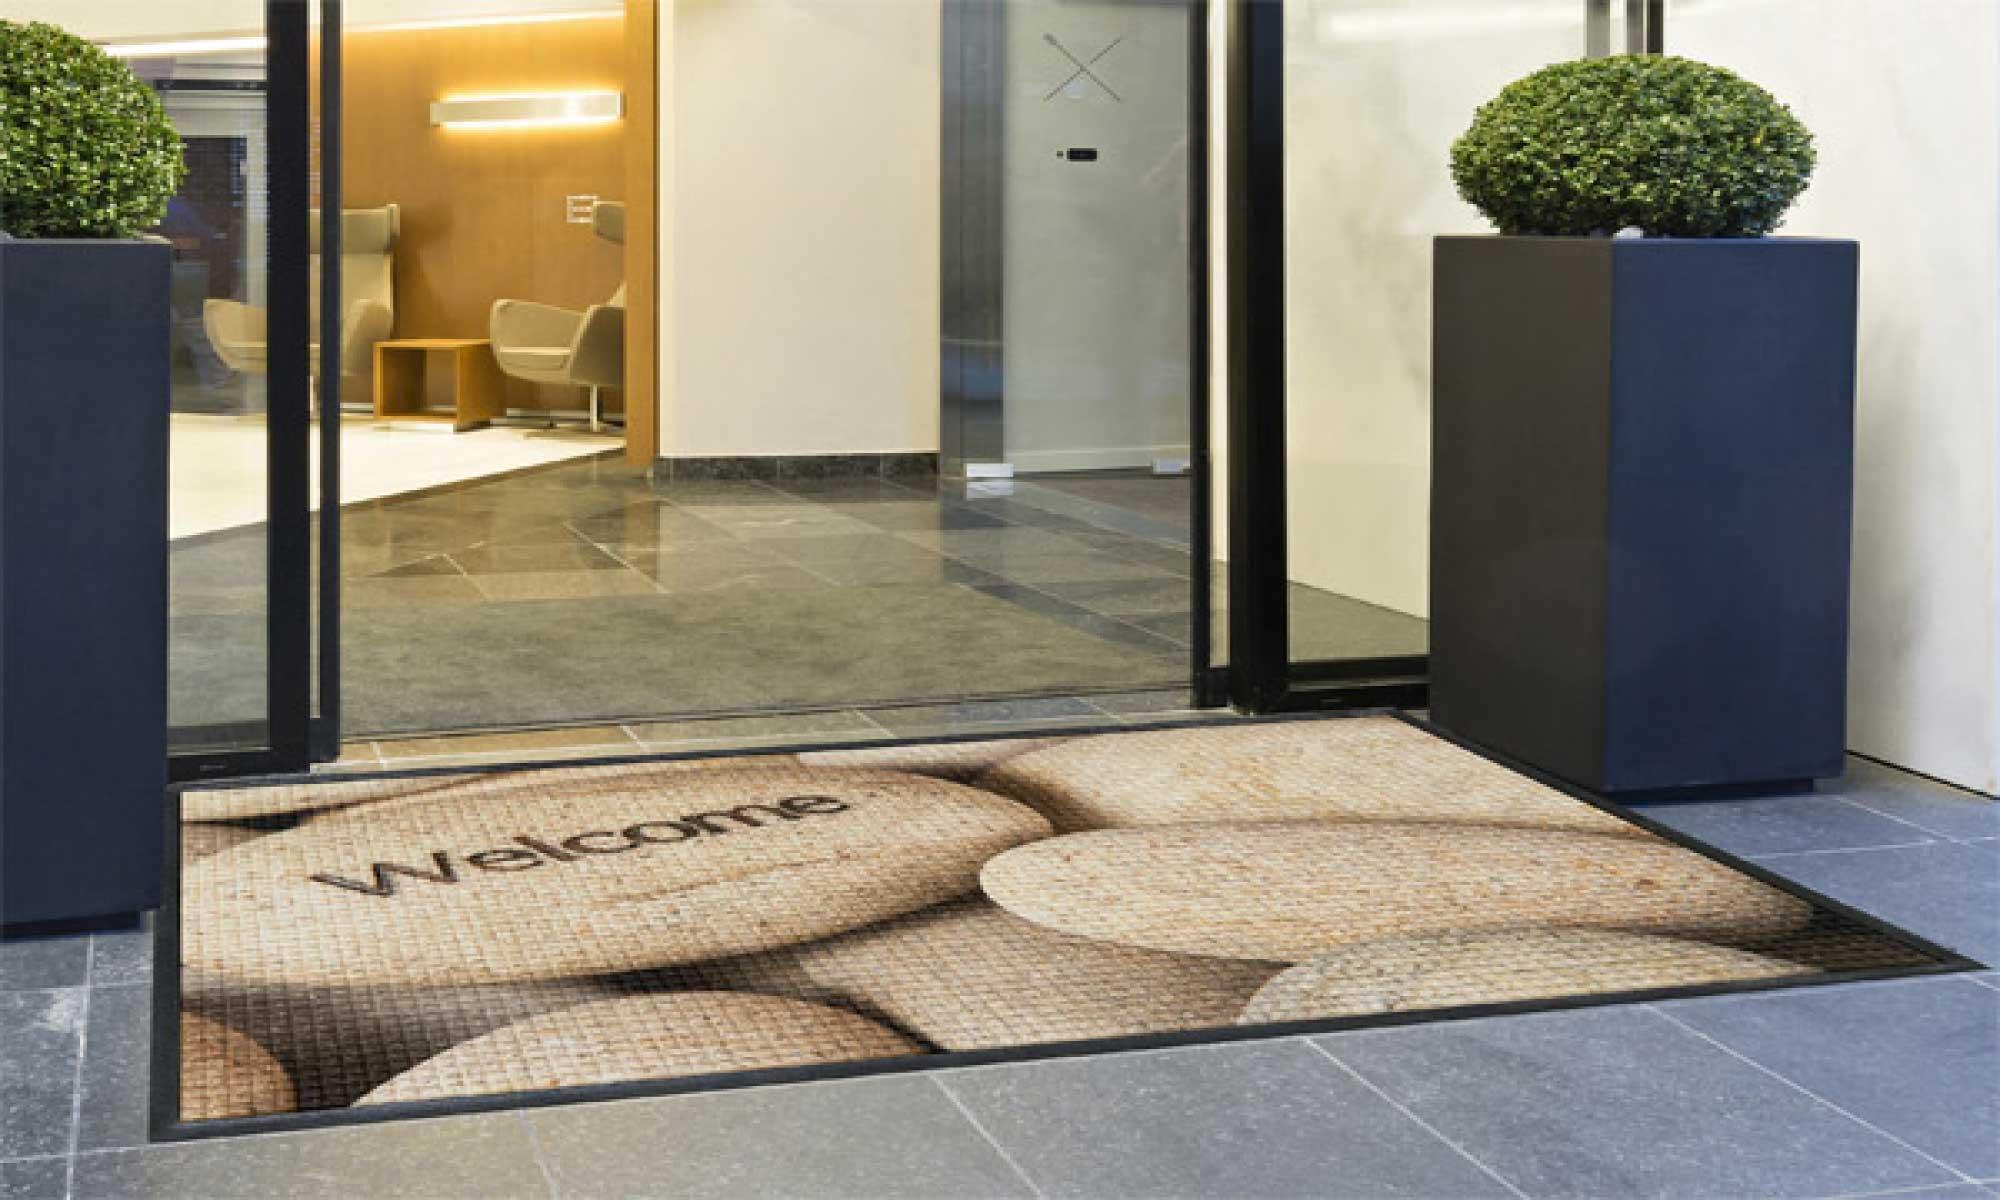 mats logo door monogrammed on info donatz unique custom charming to mat floor customized for back